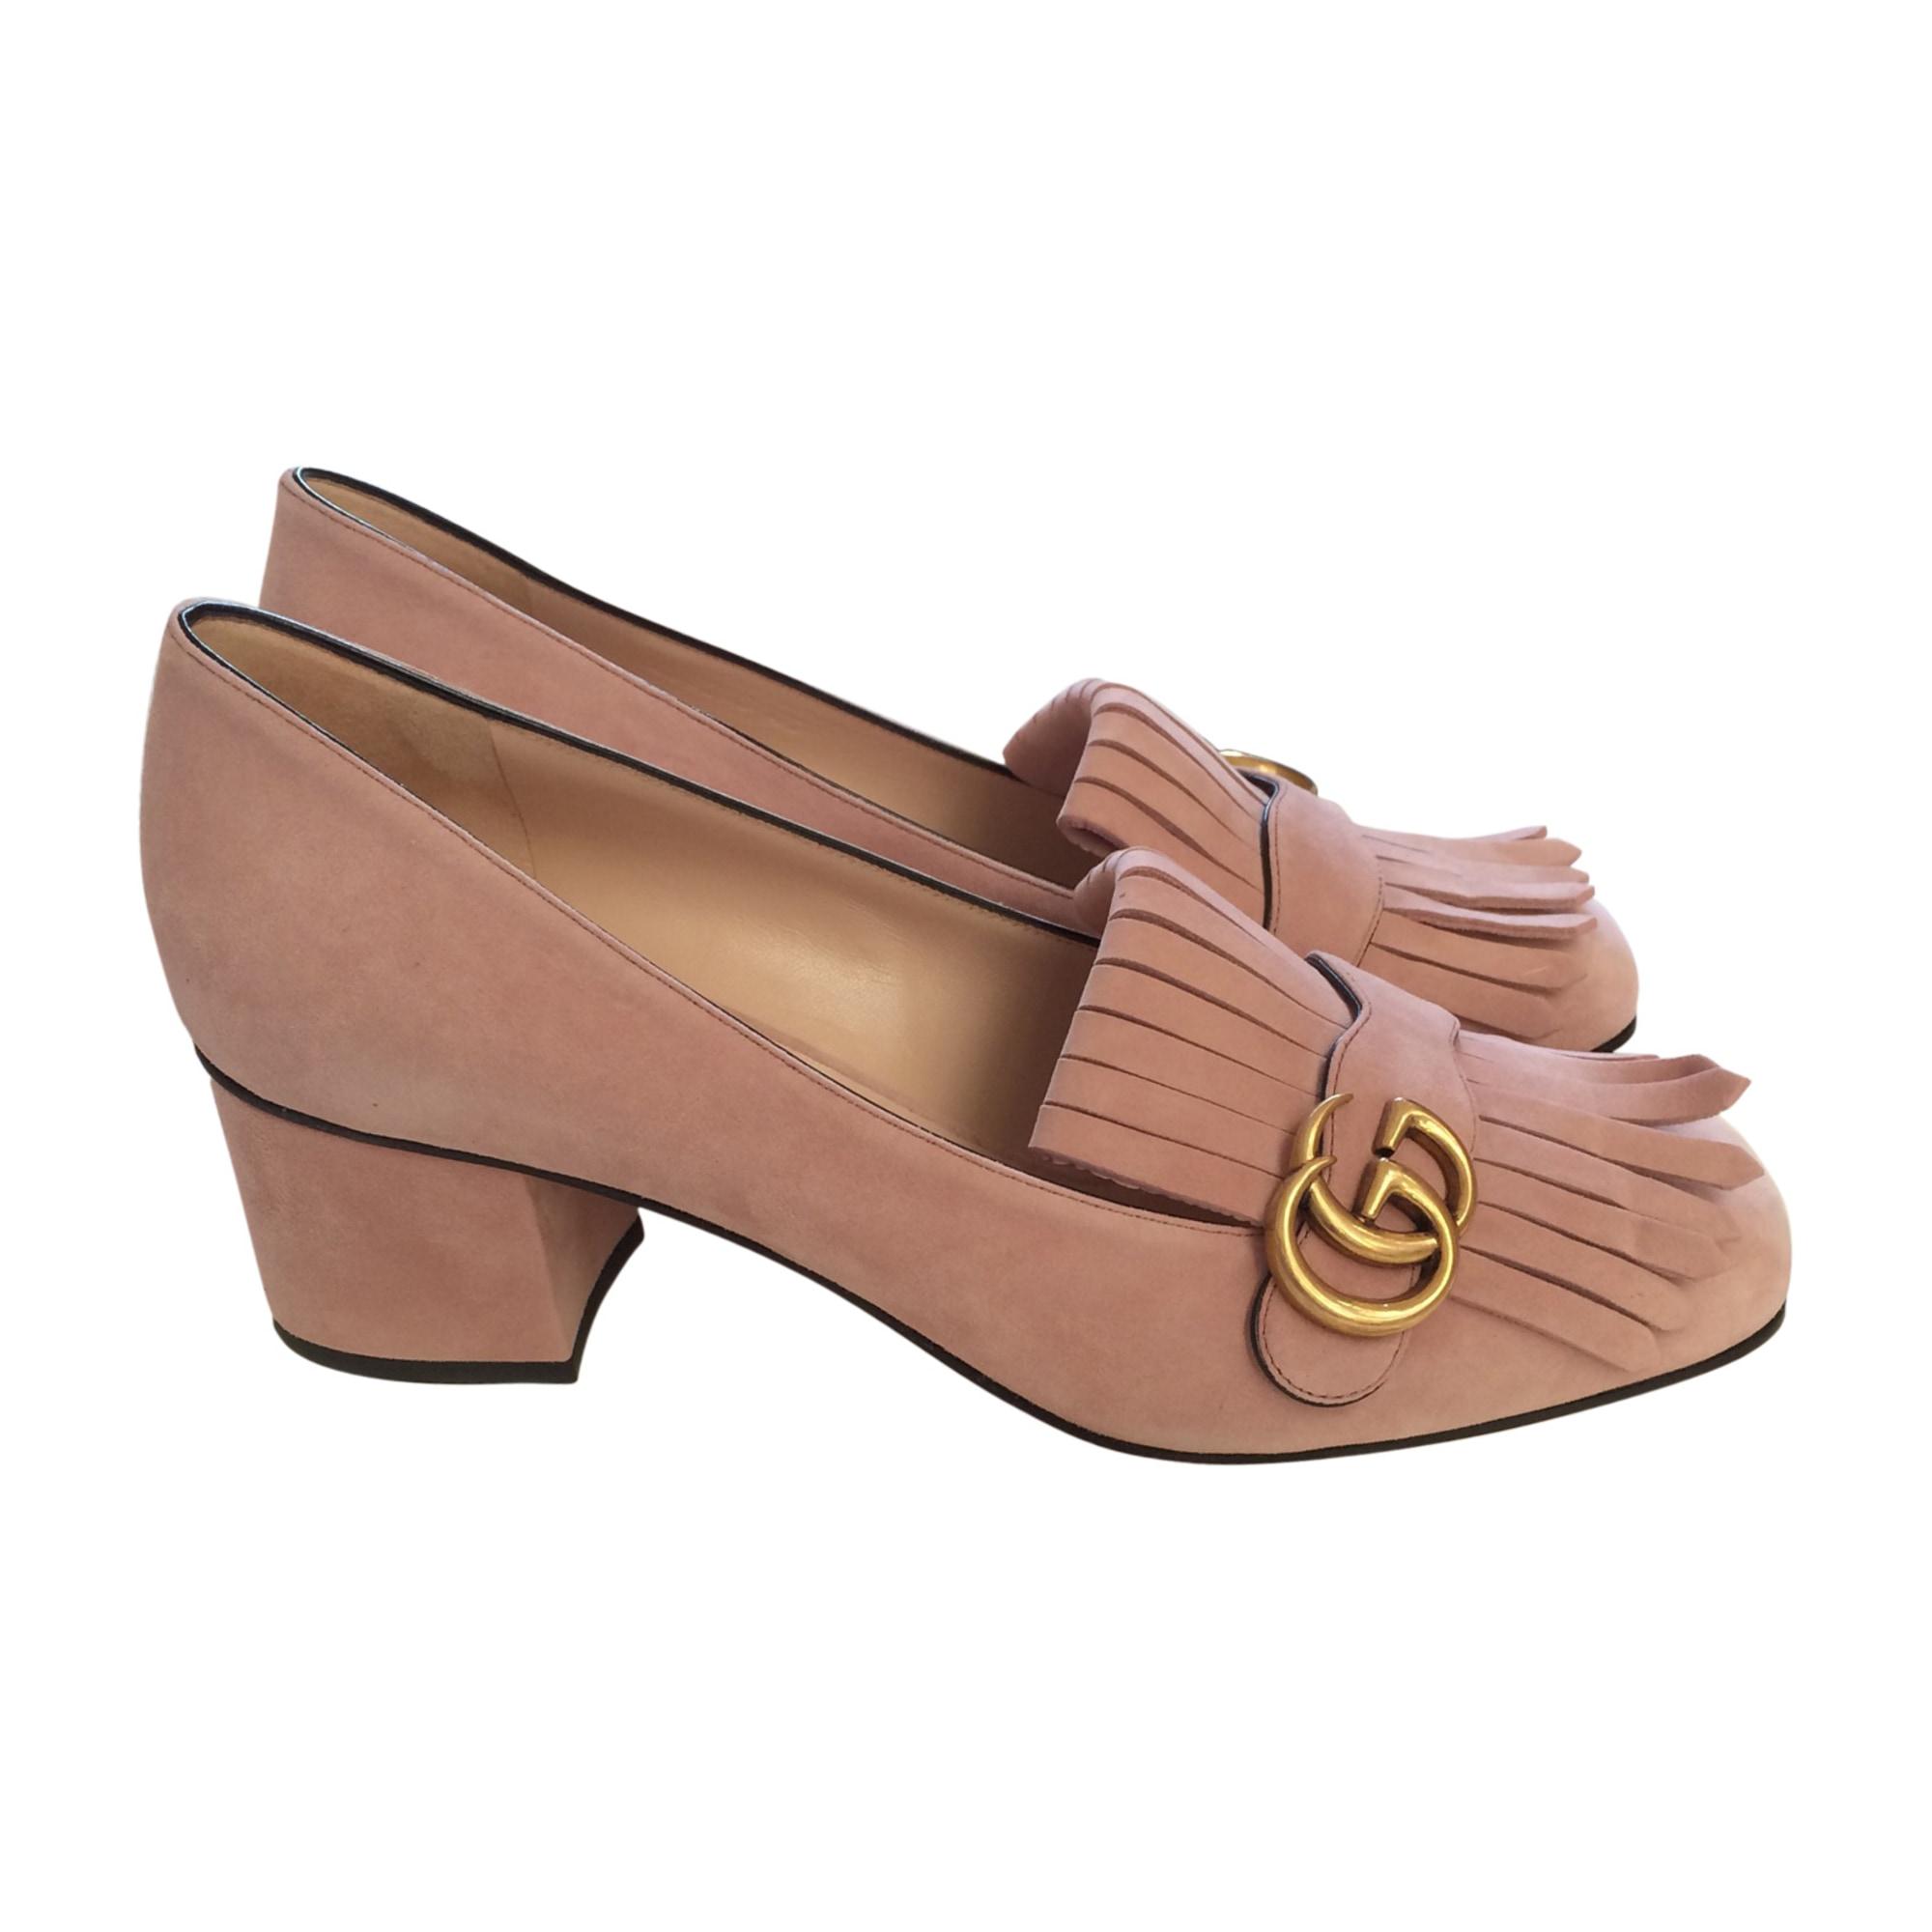 Pumps, Heels GUCCI Pink, fuchsia, light pink